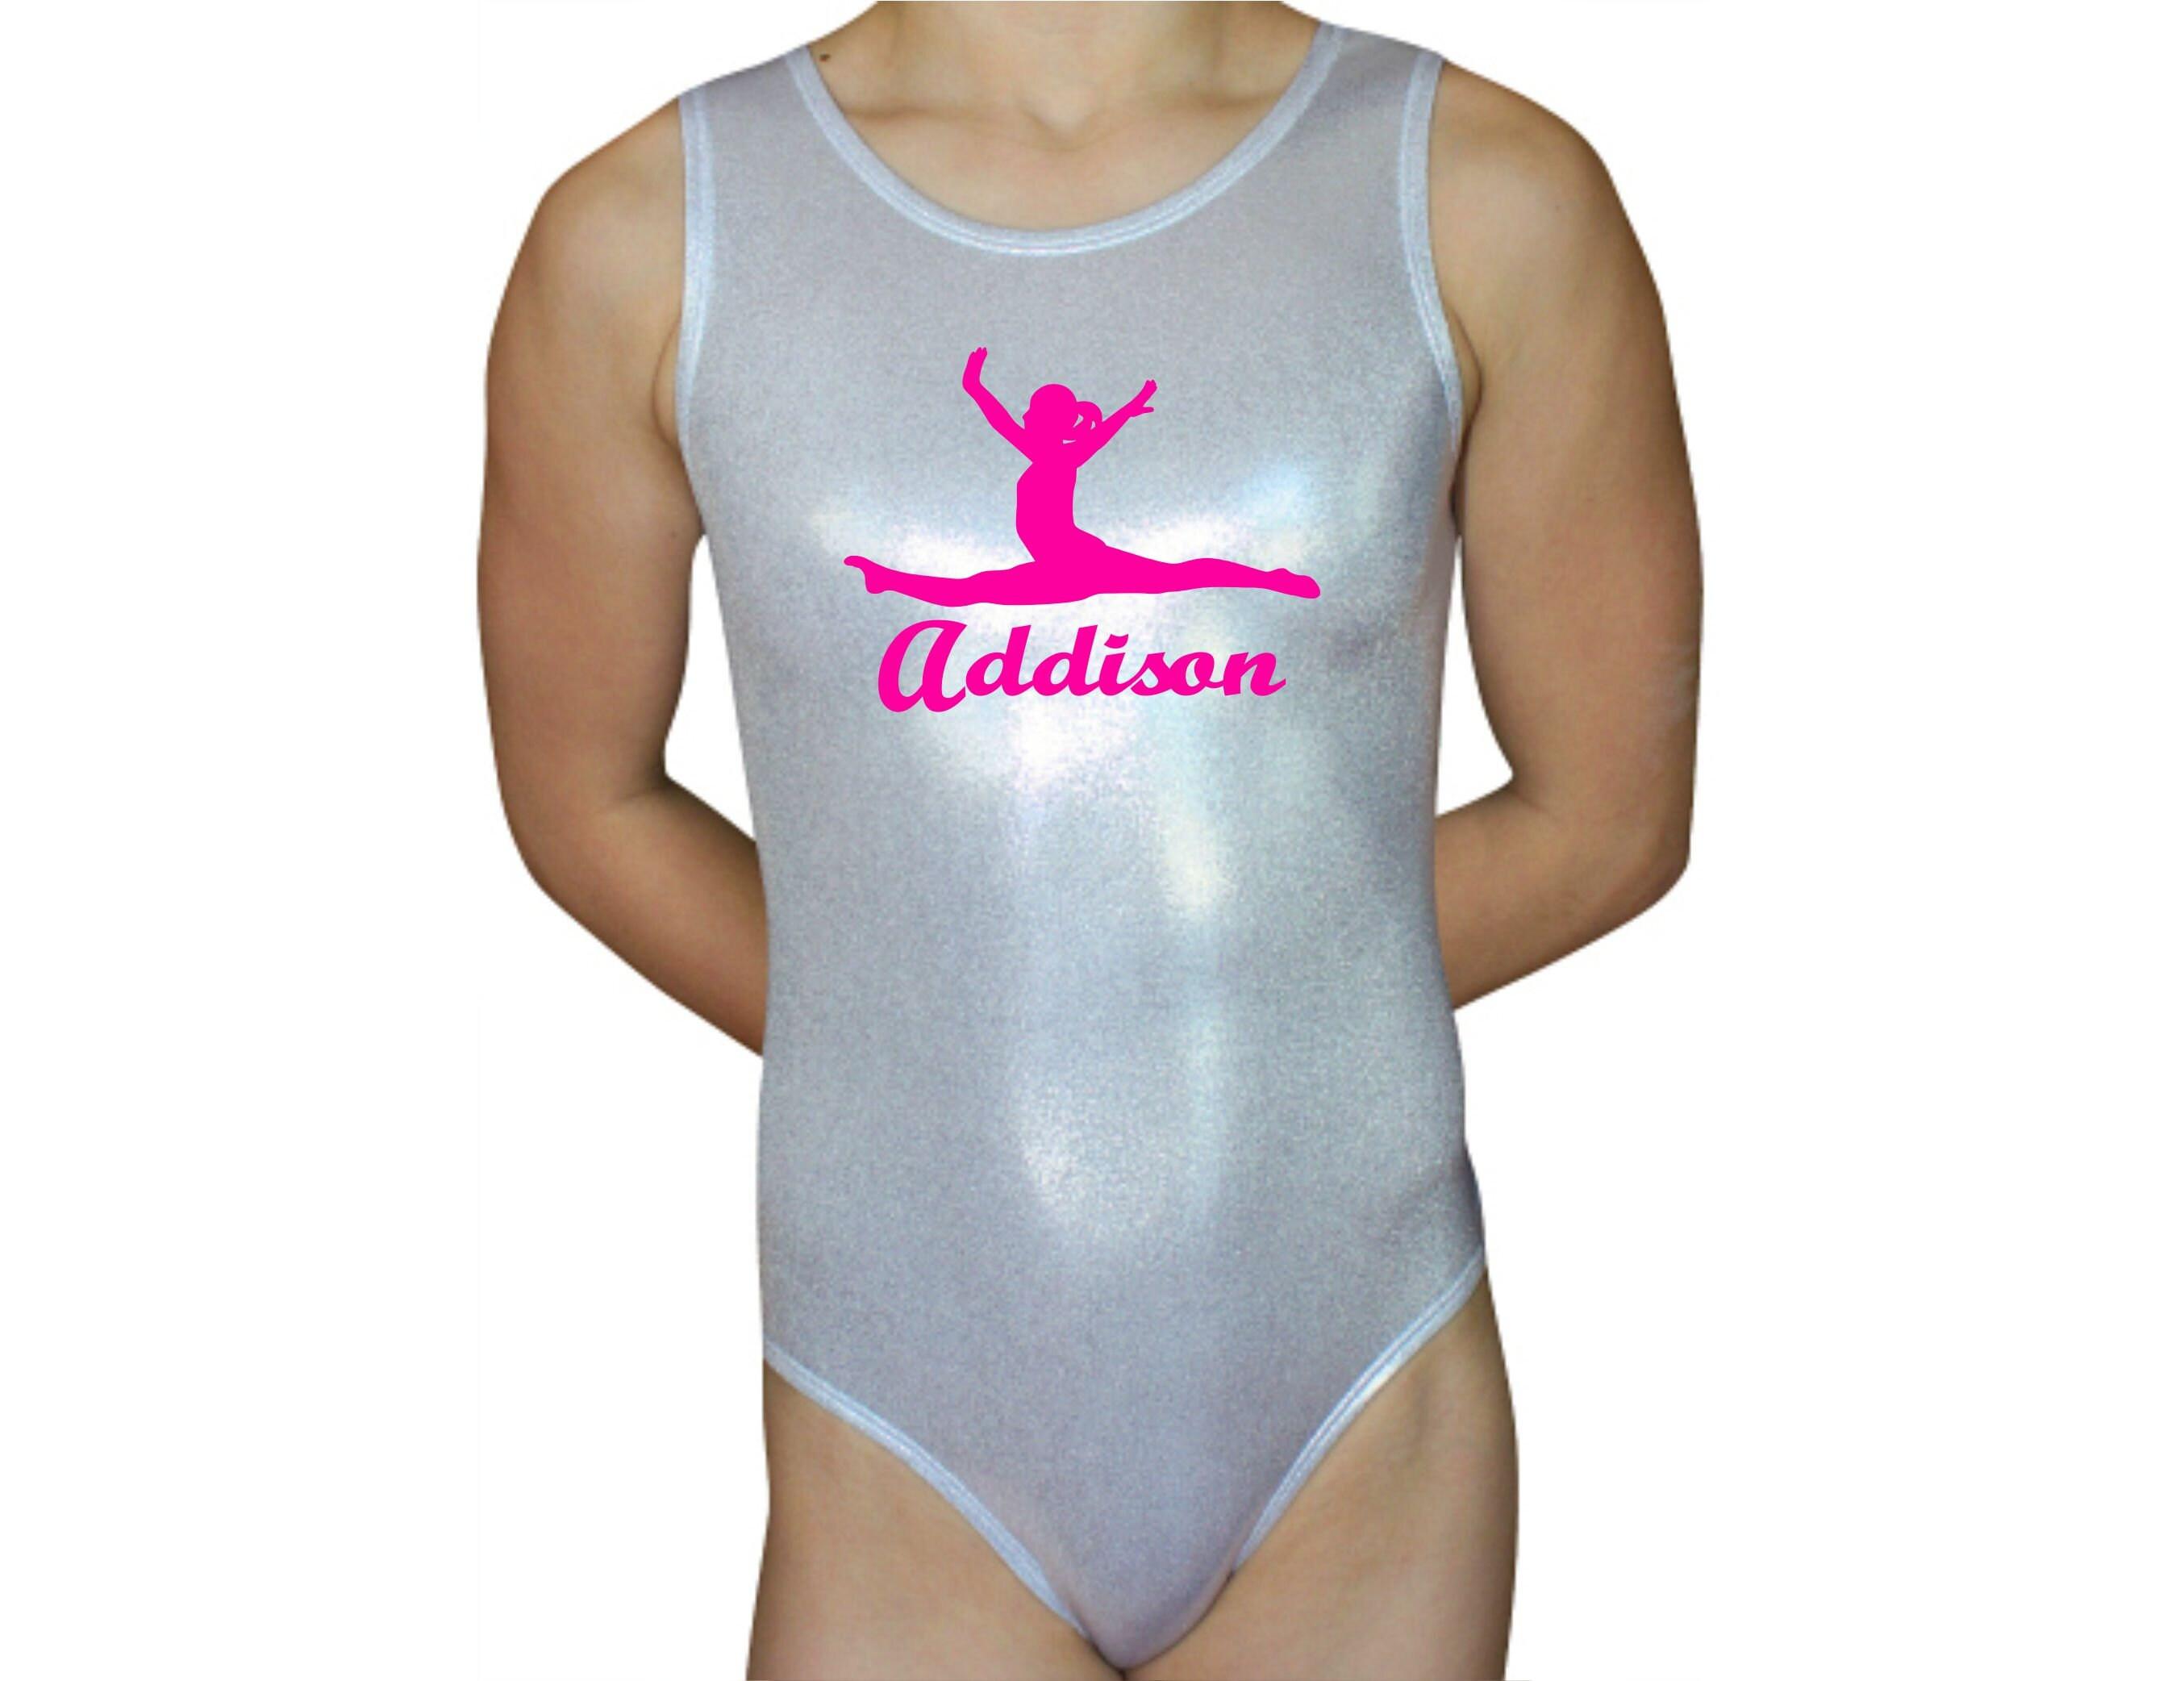 aa650adf0 Gymnastics Leotard Girls Bodysuit Dance Leotard Personalized